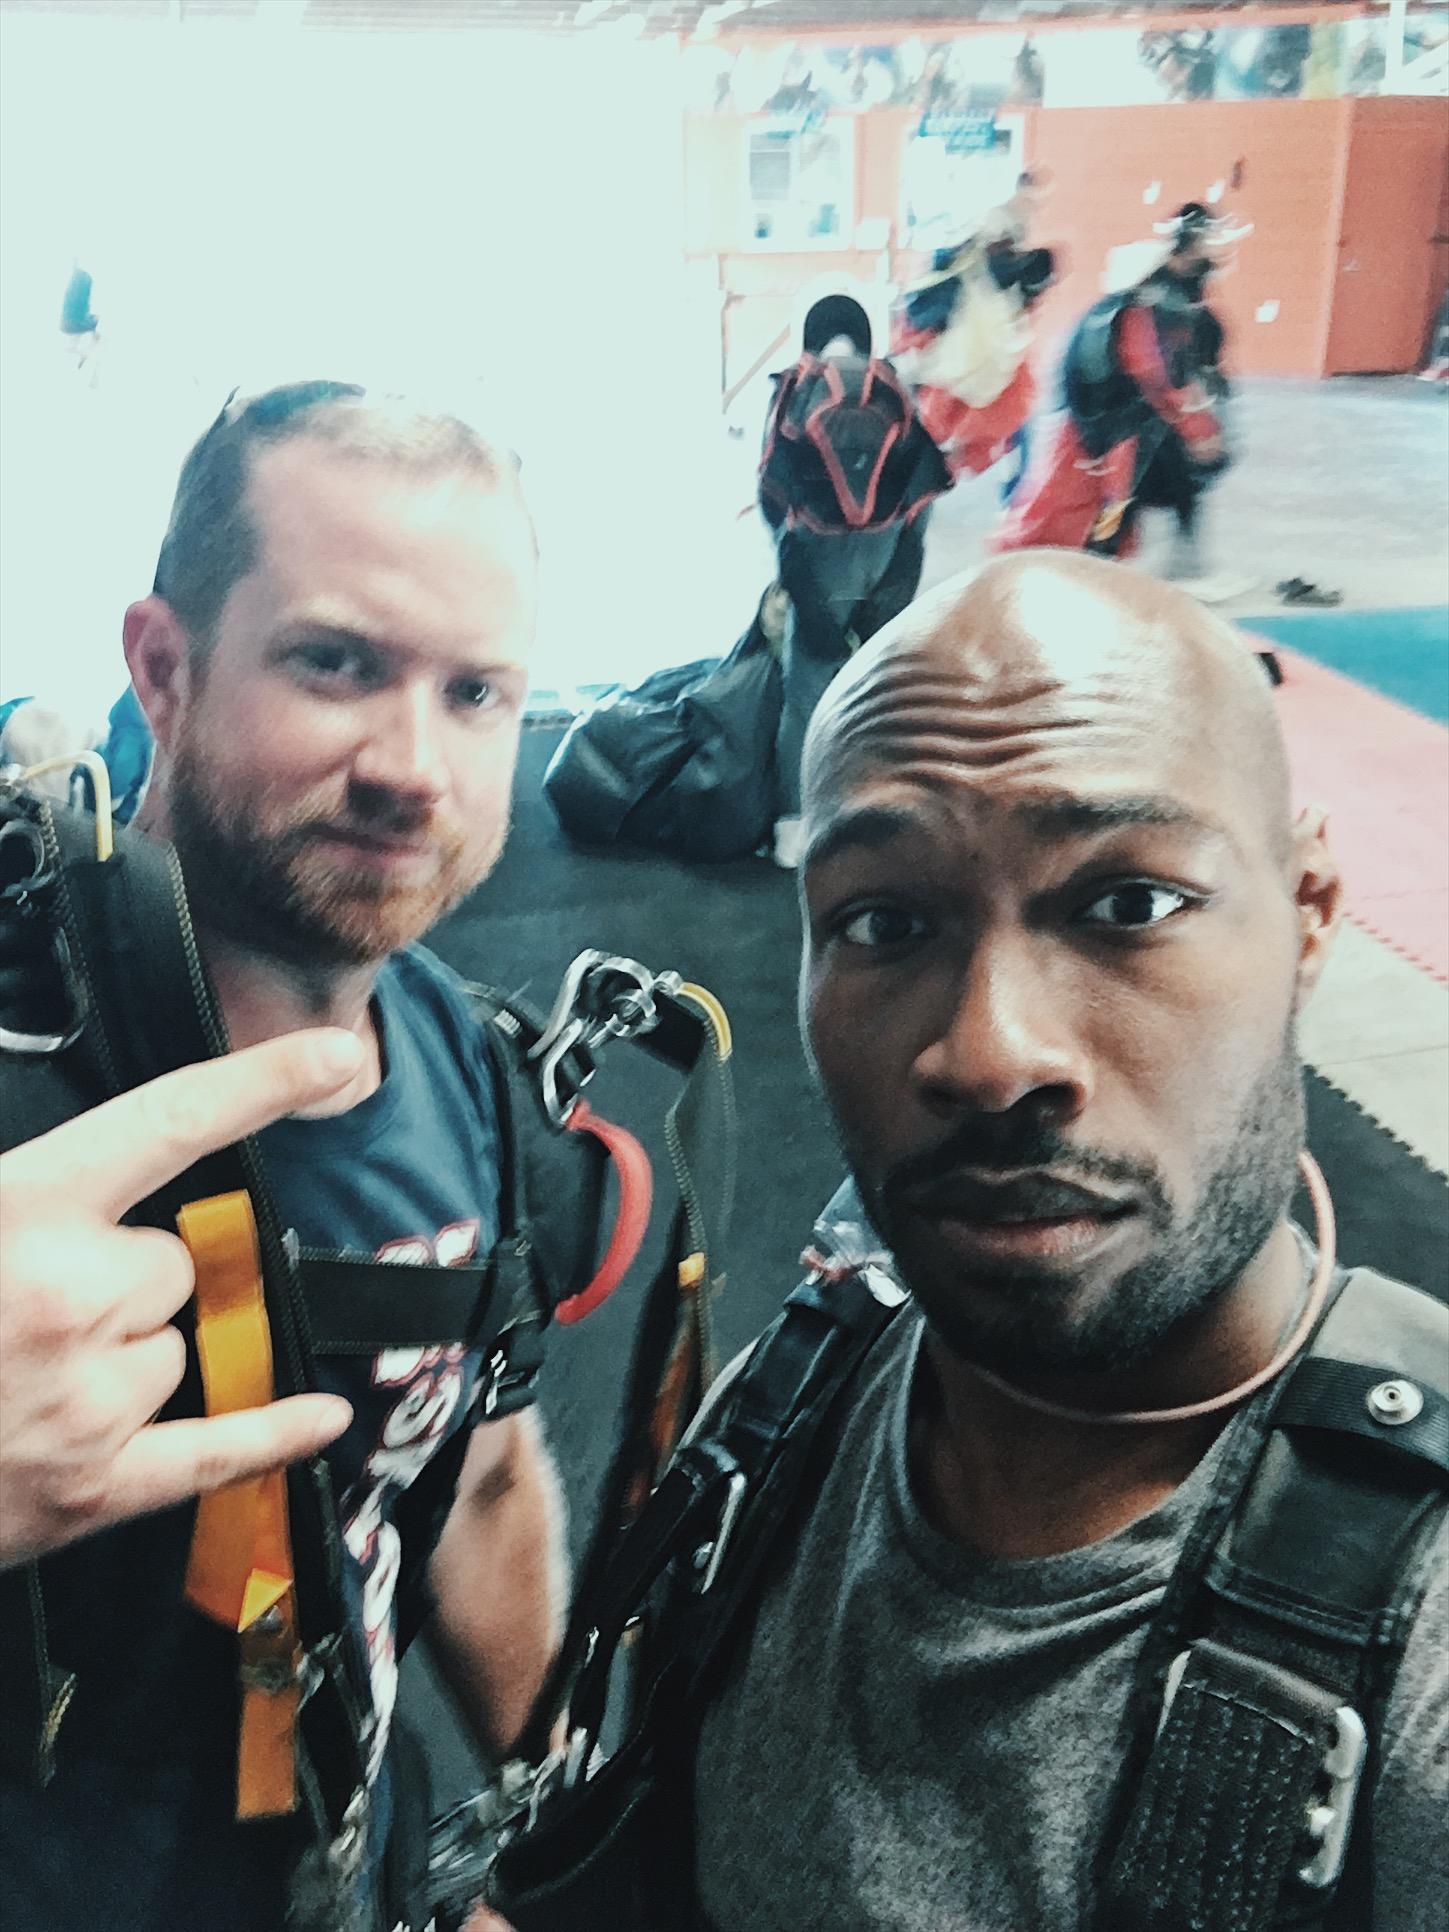 skydiving-cj johnson-washington dc-adventure